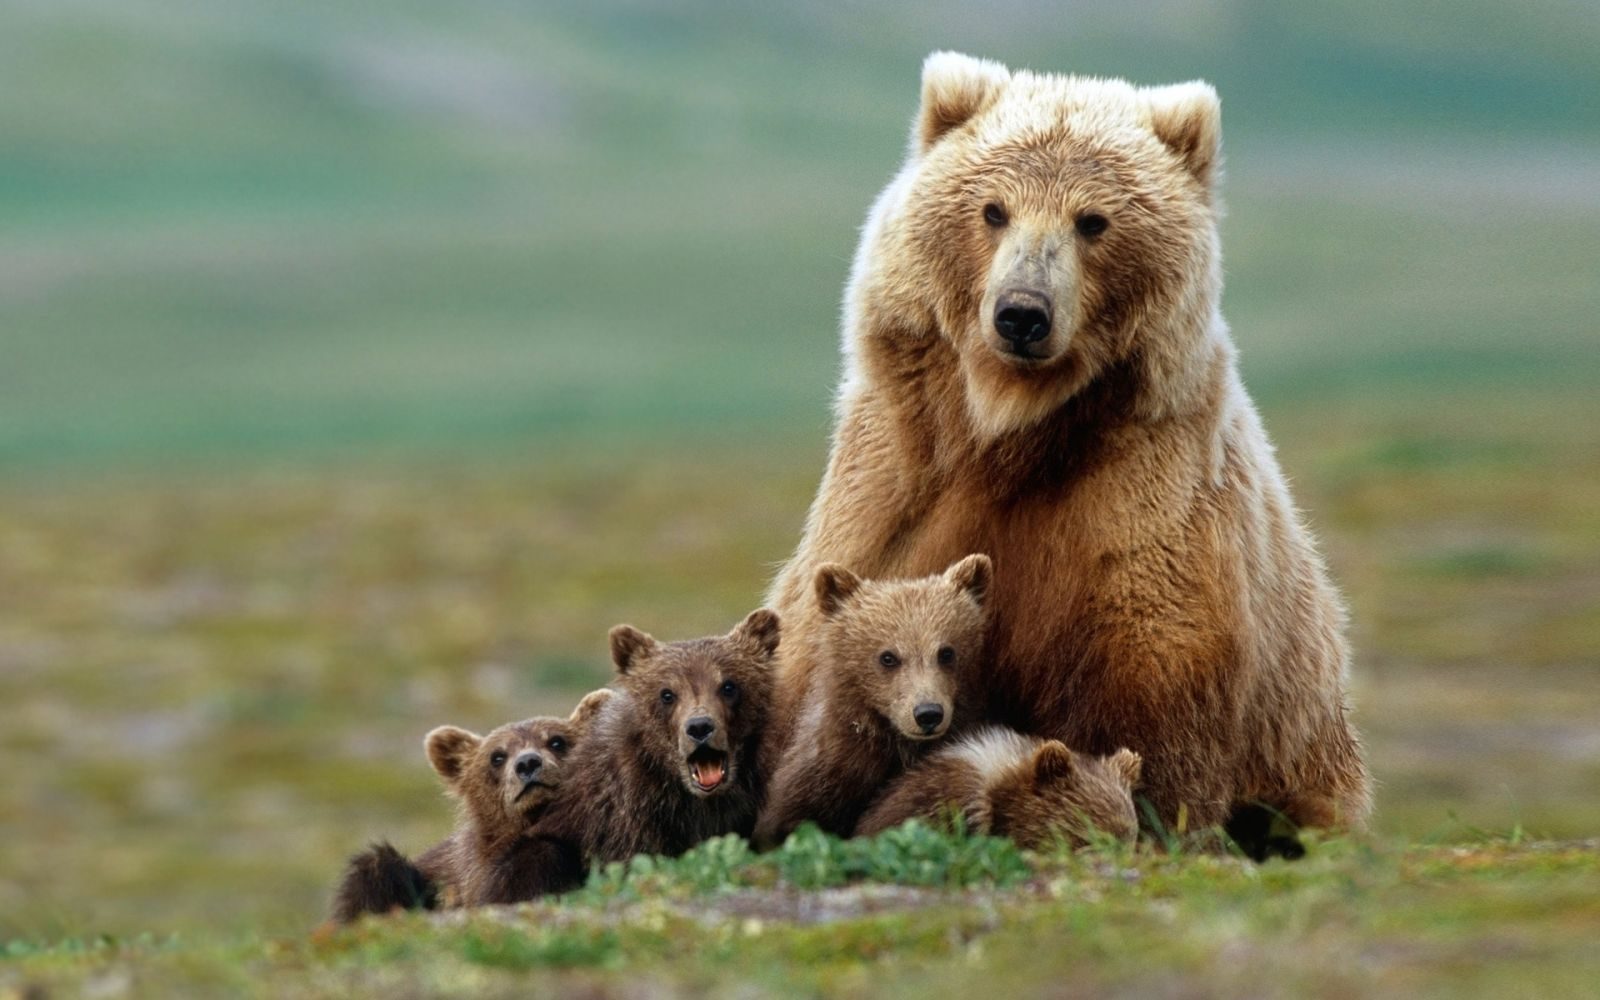 burij+medved+medvedi+medved+zhivotnie+45623873105.jpg (1600×1000)